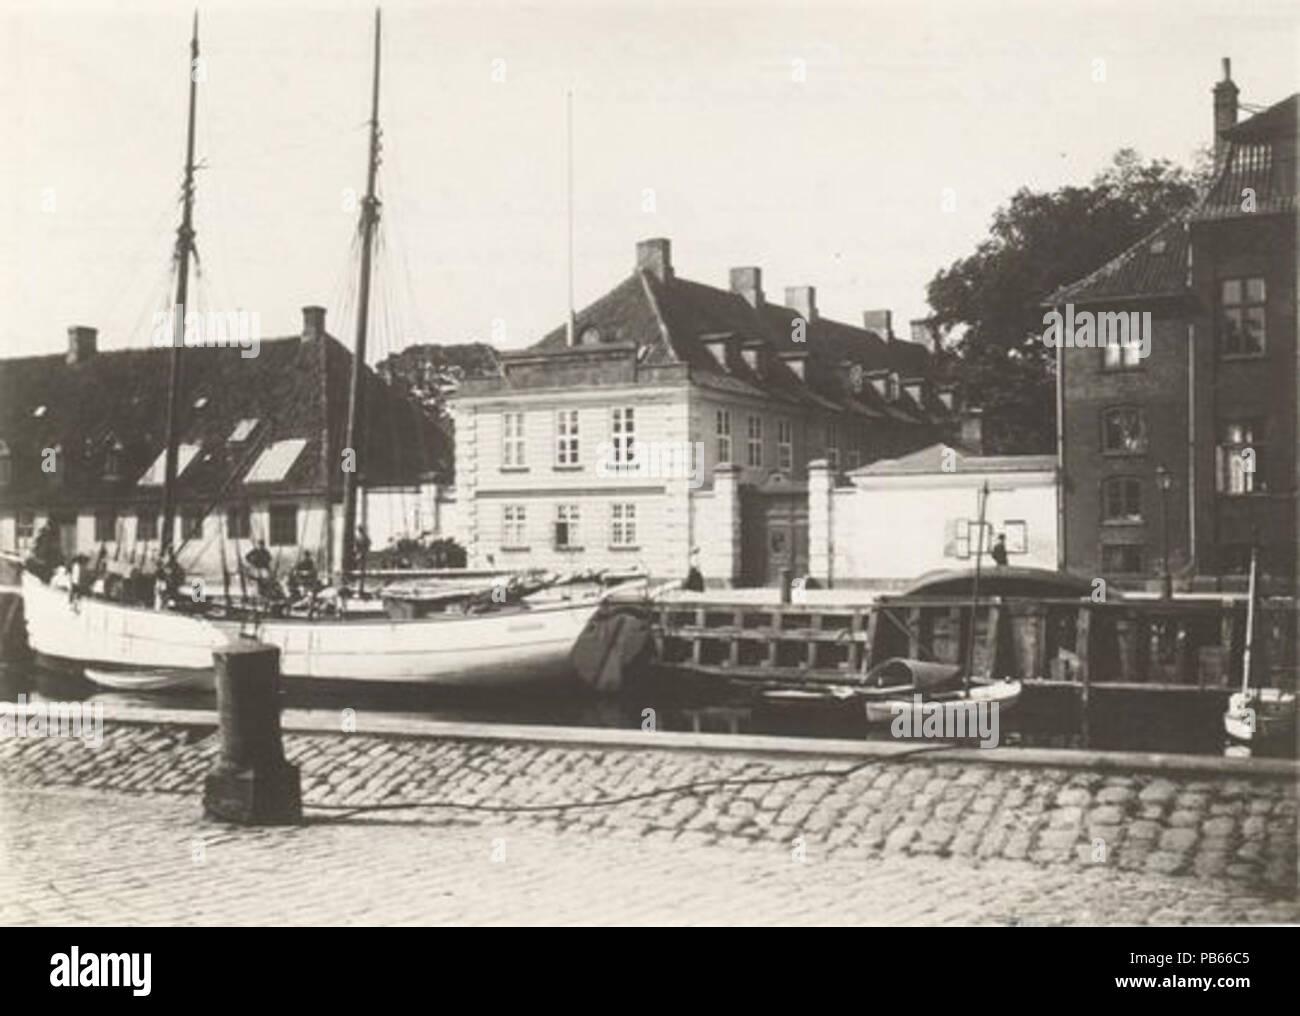 . English: Late 19th century photo of the Royal Horse Guards Barracks at Frederiksholms Kanal in Copenhagen, Denmark . late 19th century 757 Hestegardekassernen (late 19th century) - Stock Image